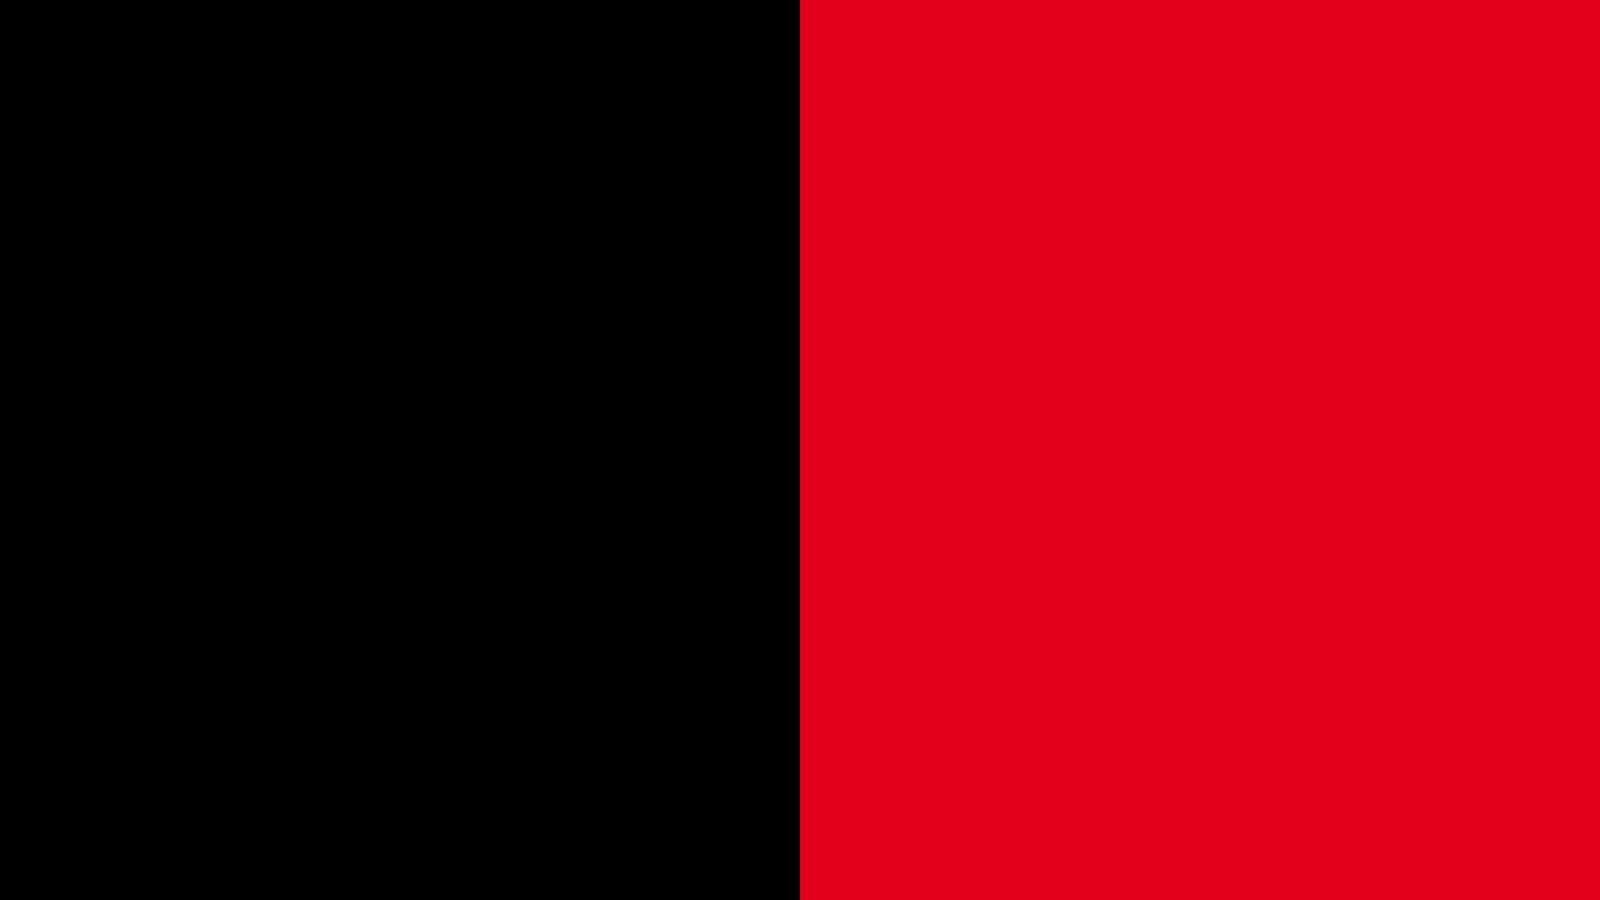 Grafik - Koalition Flagge - Große Koalition - Schwarz-Rot